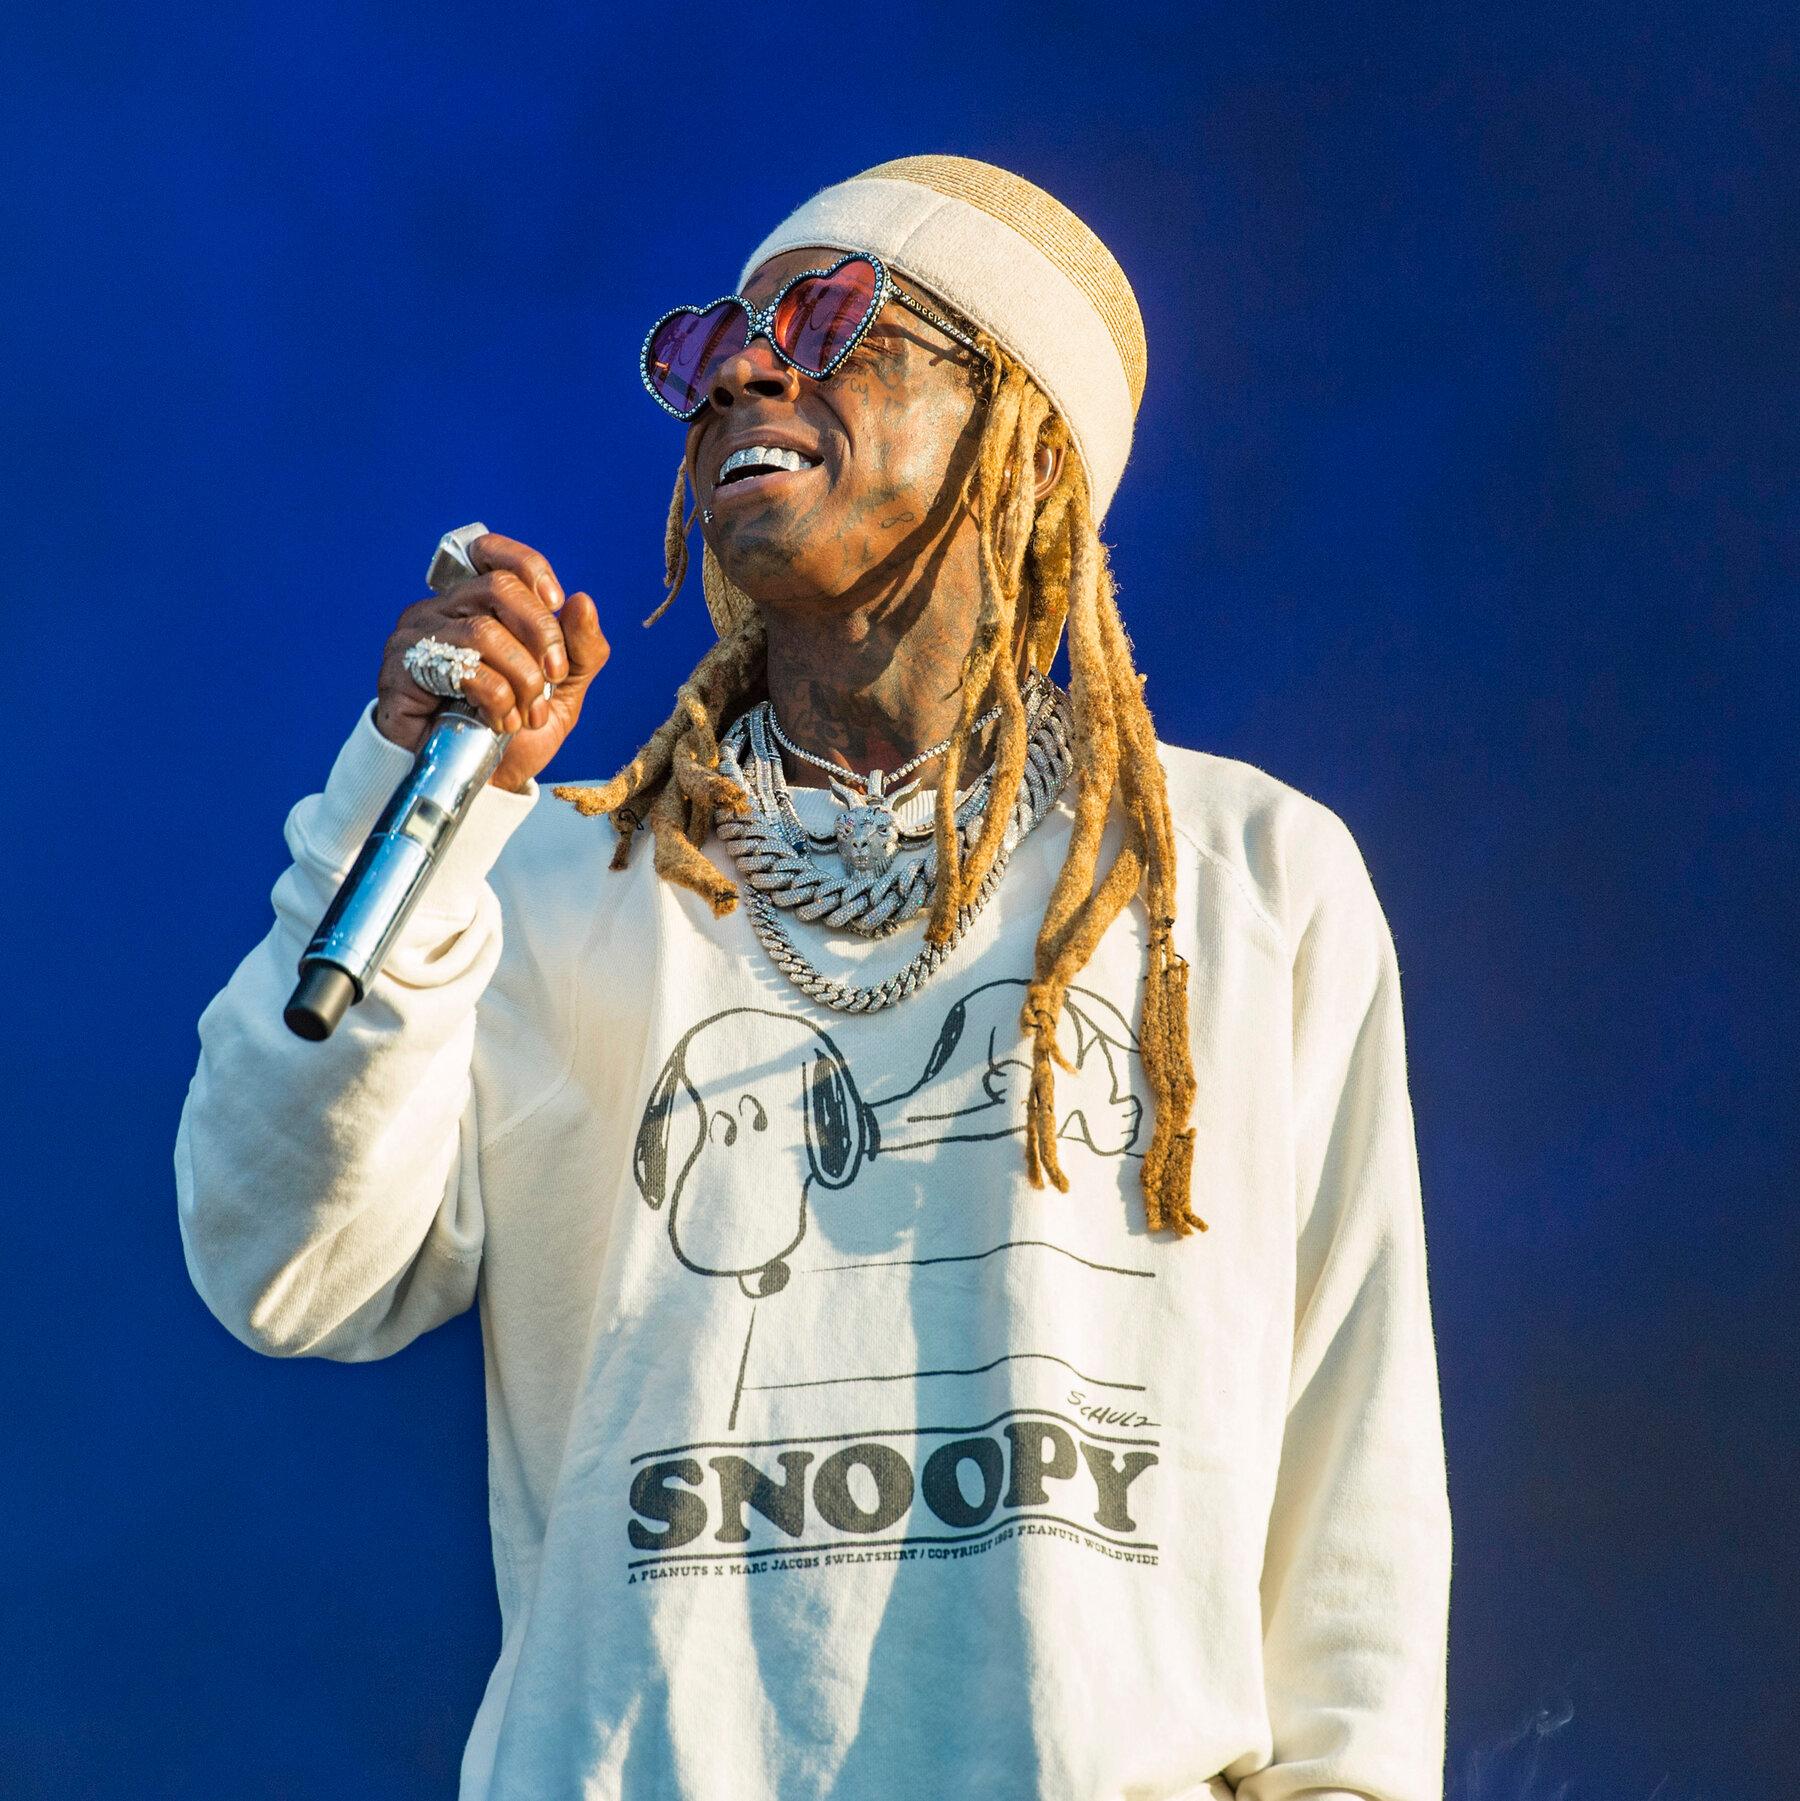 Networth of Lil Wayne